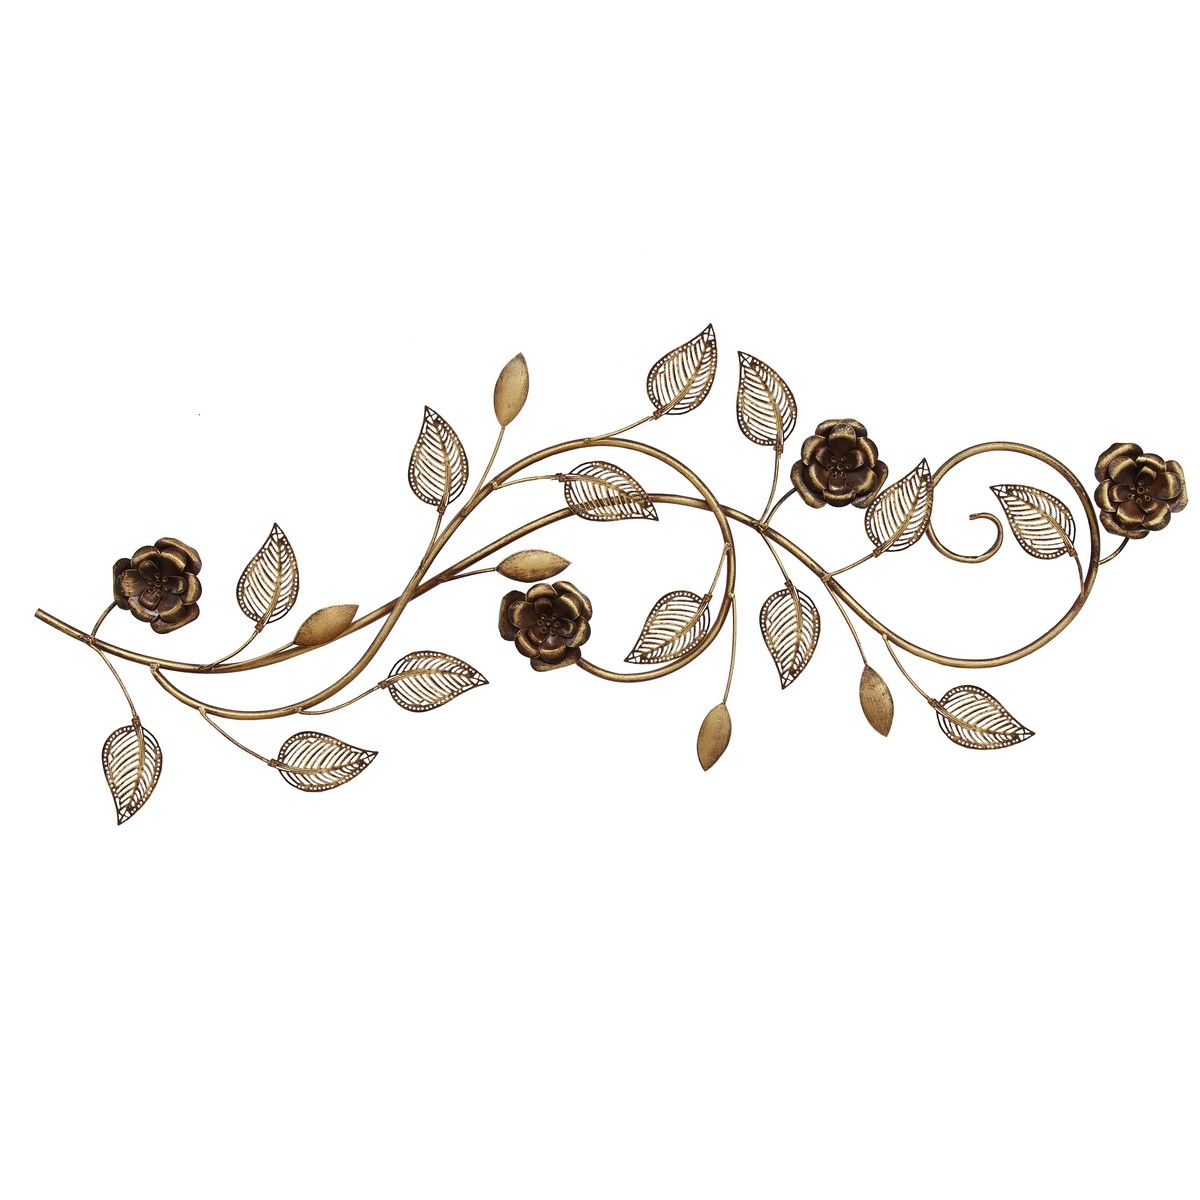 Stratton Home Decor Patina Scroll Leaf Metal Wall Art ~ Stratton home decor rose scroll wall red gold